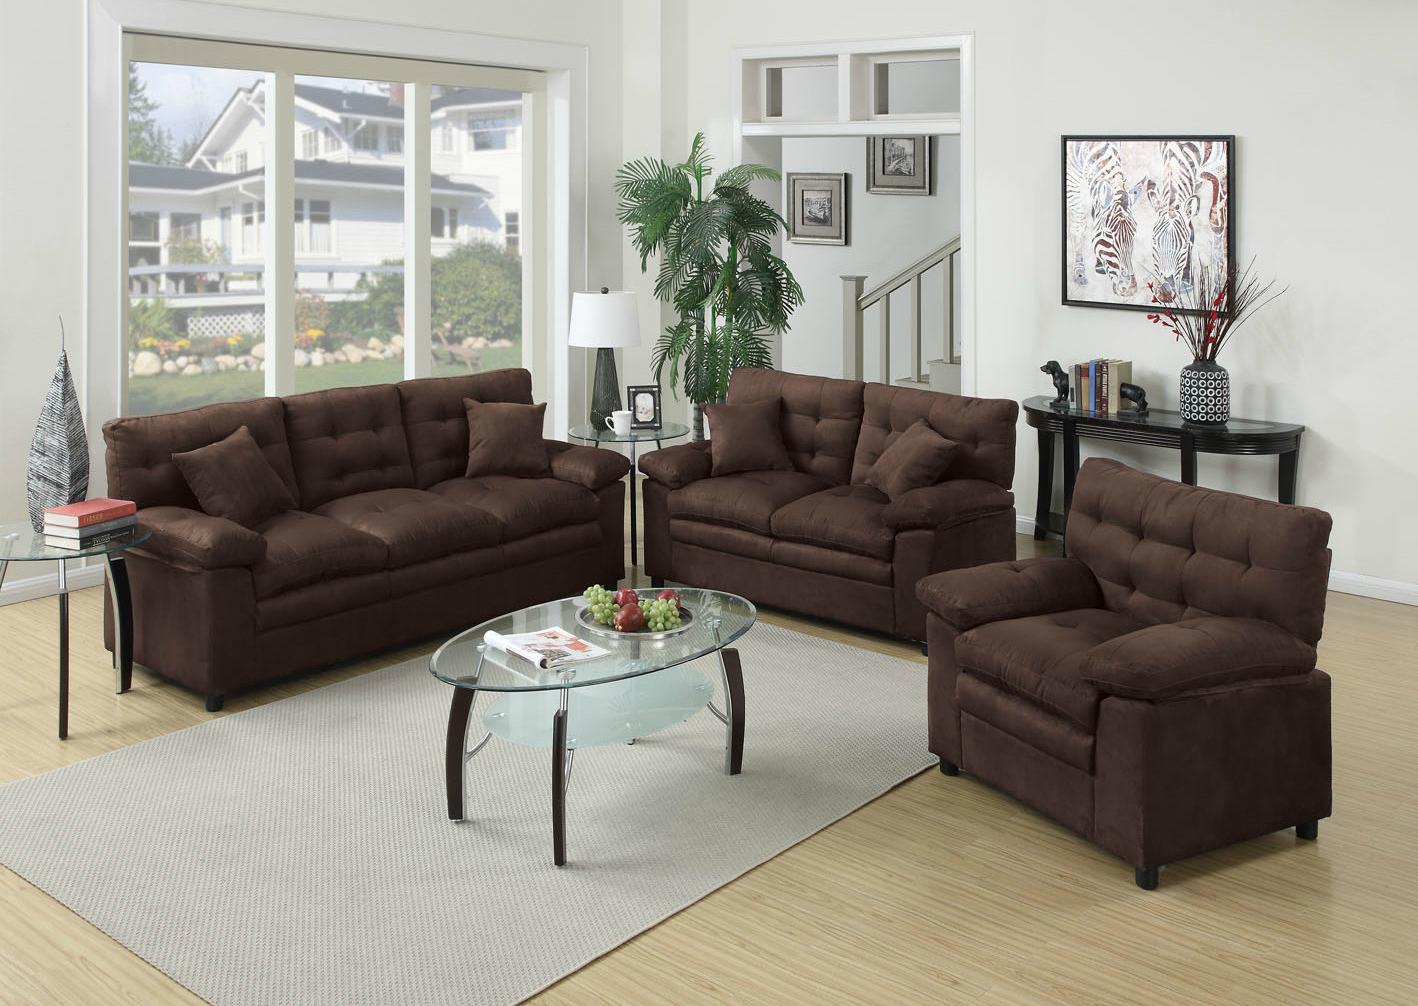 Marvelous Home/Living Room/Sofa U0026 Love Seat/3PC Sofa Set